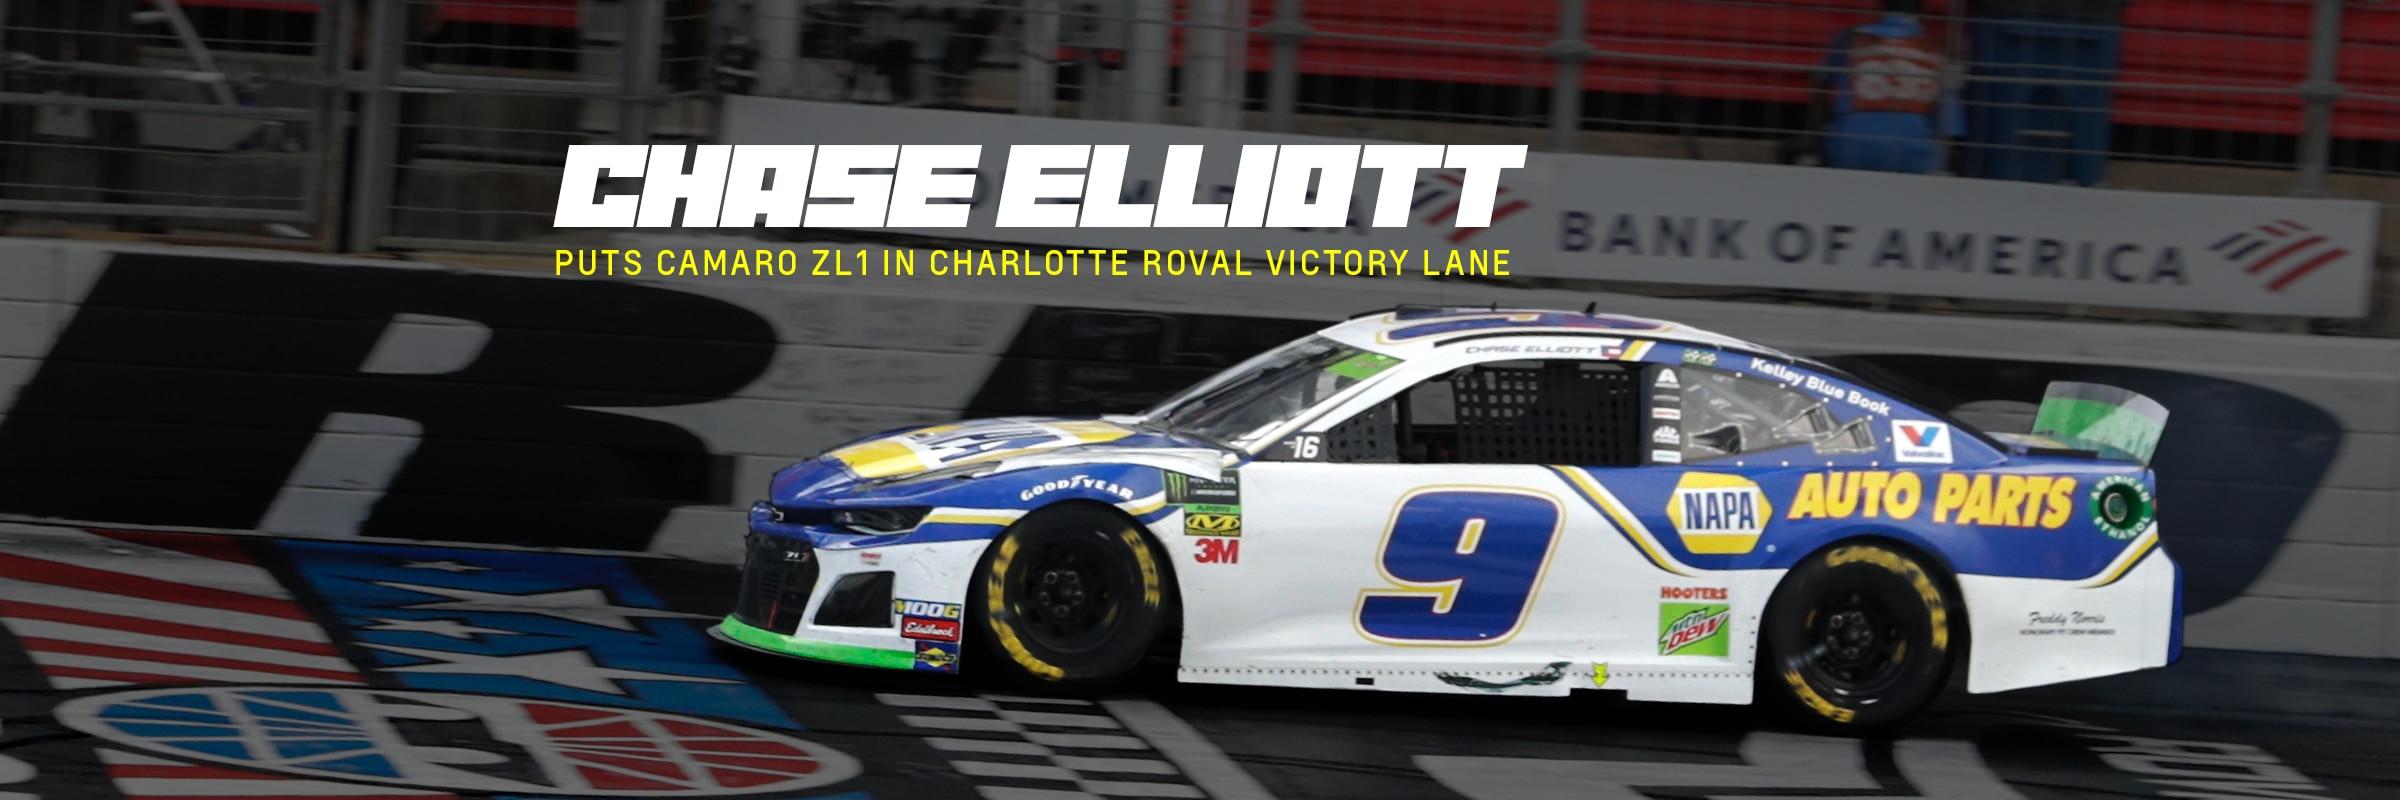 Chase Elliott Puts Camaro ZL1 in Charlotte Roval Victory Lane 2400x800